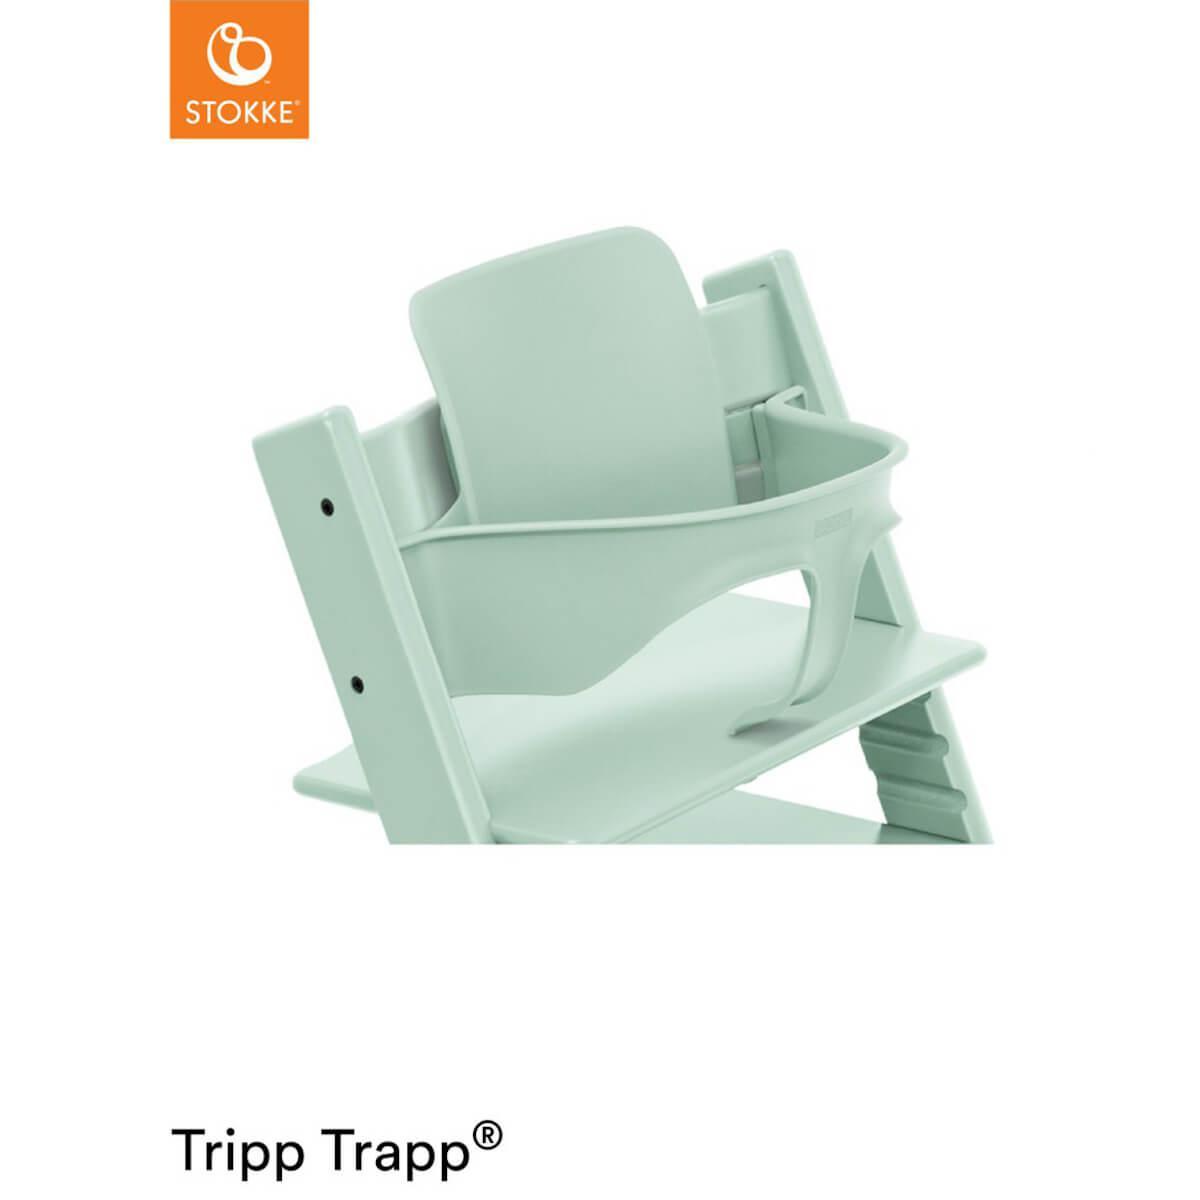 Baby set trona bebé TRIPP TRAPP Stokke Soft Mint